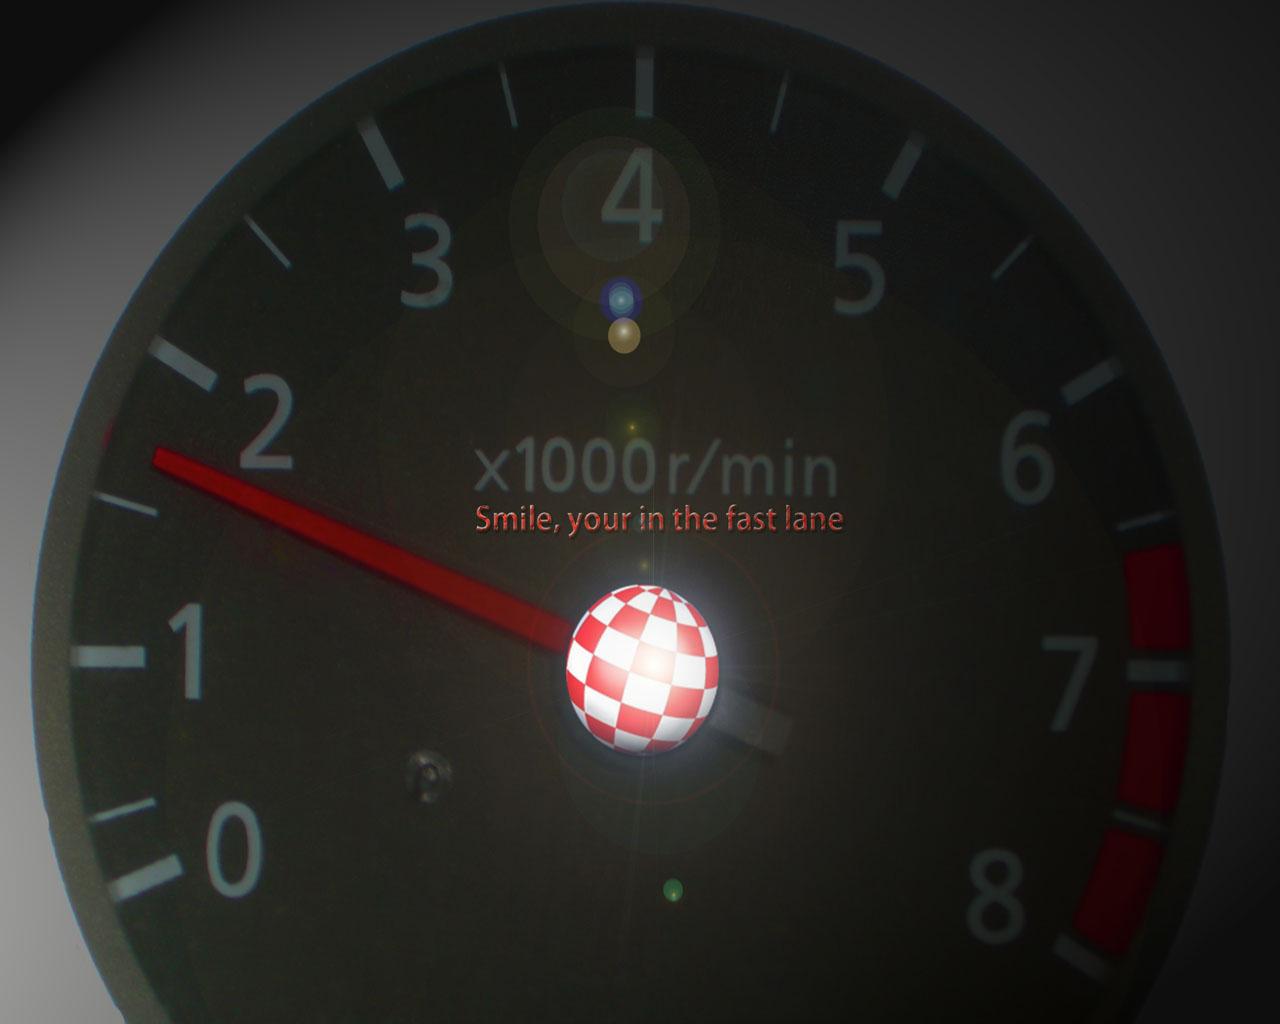 AmigaX1000 logo